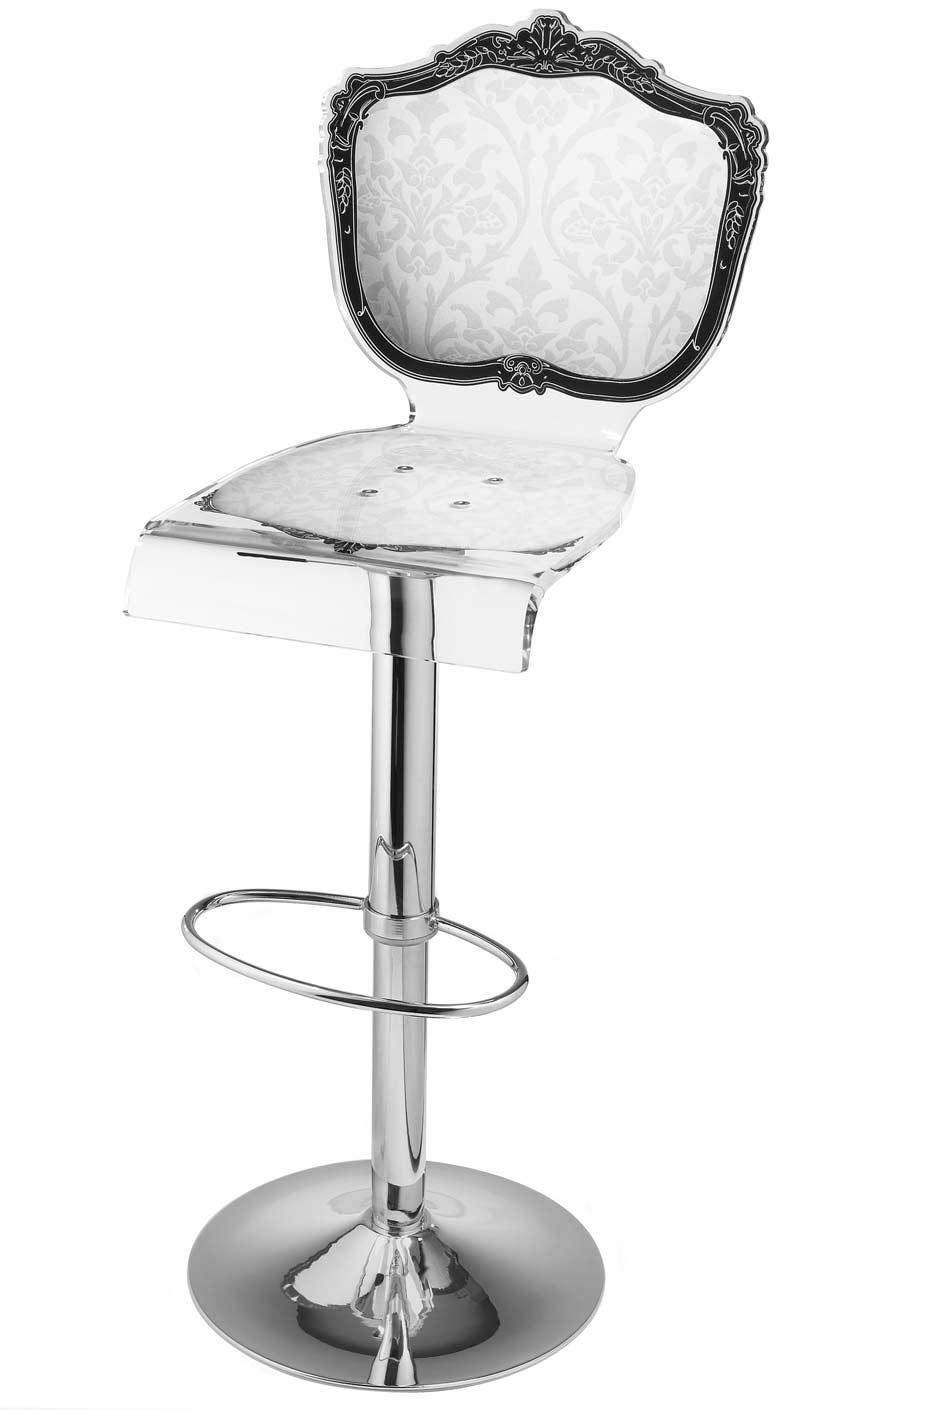 tabouret baroque en plexiglas motif blanc acrila sp cialiste du plexiglas r f 11030363. Black Bedroom Furniture Sets. Home Design Ideas